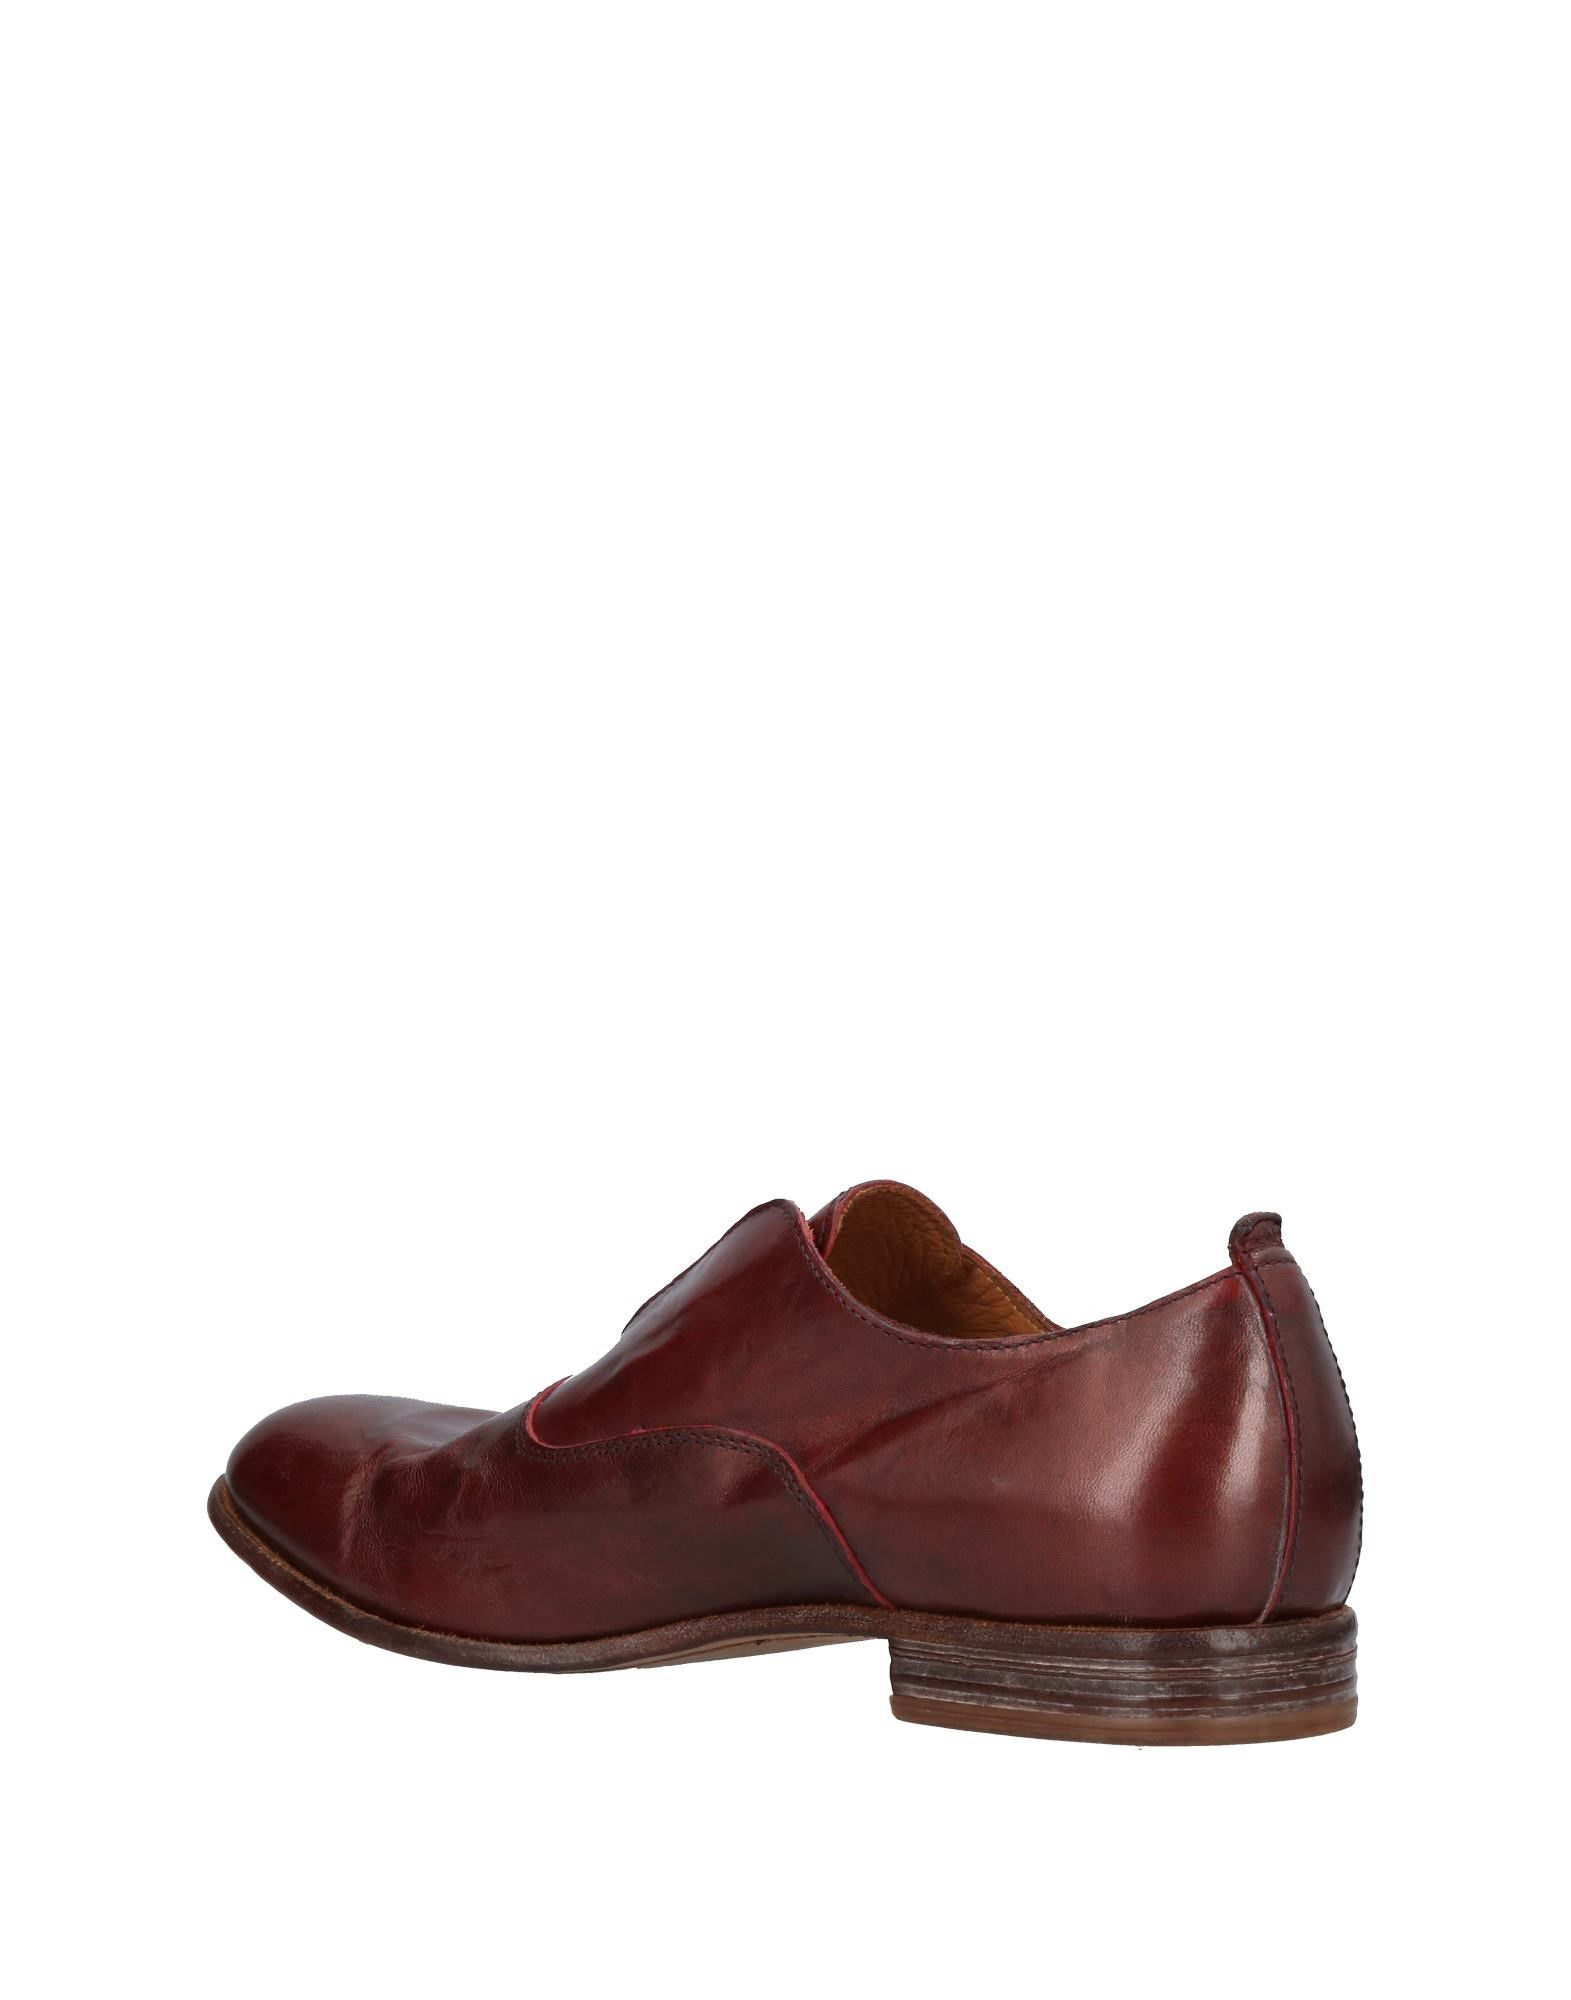 Moma Mokassins Herren  11411983CP Gute Qualität beliebte Schuhe